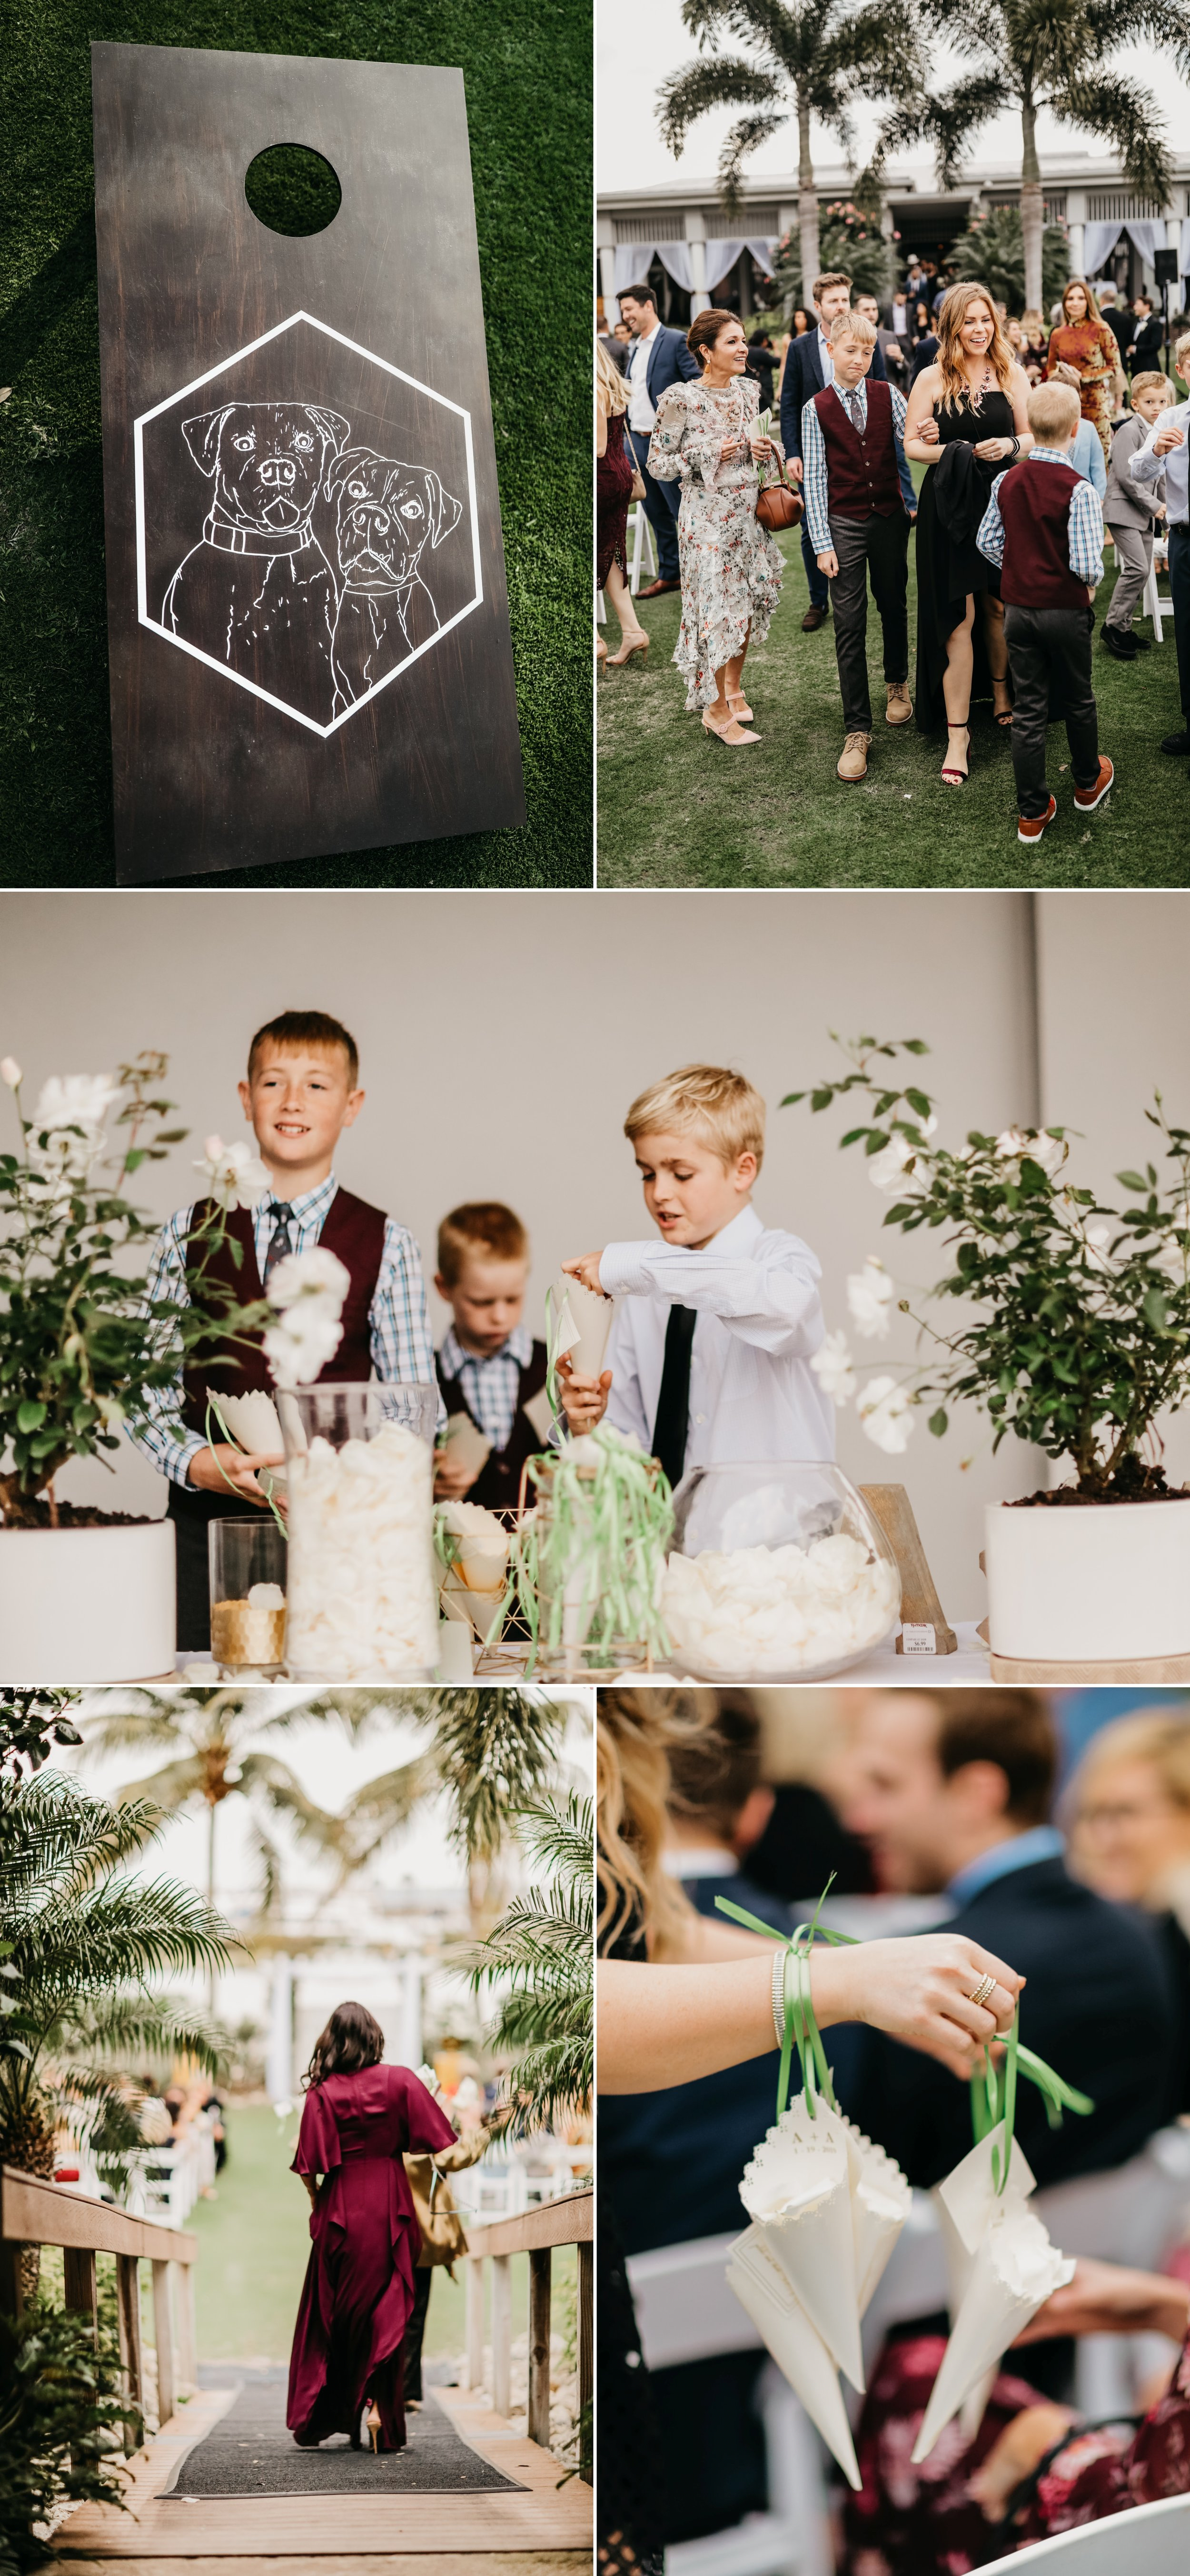 Luxe_tropical_travel_destination_wedding_photography_ShainaDeCiryan.com15.jpg